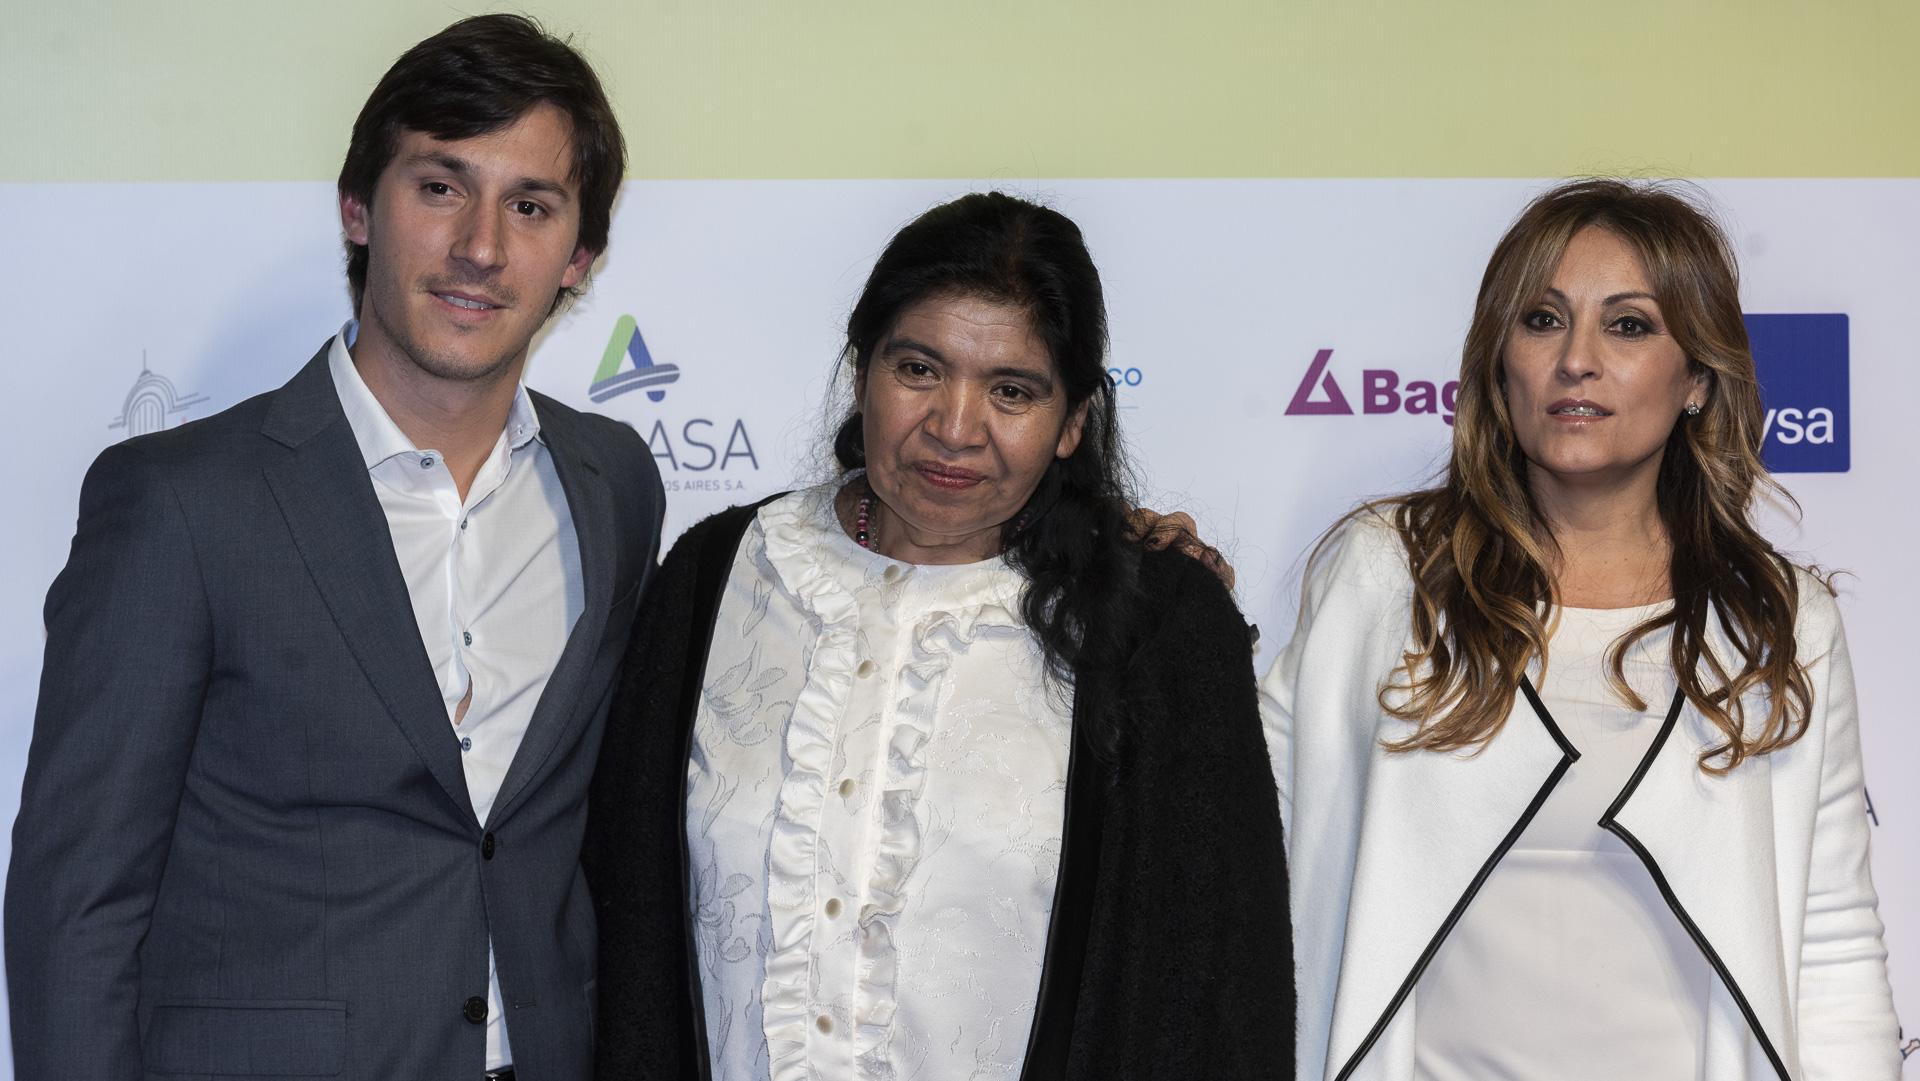 La periodista Marcela Tauro entre las invitadas a la gala